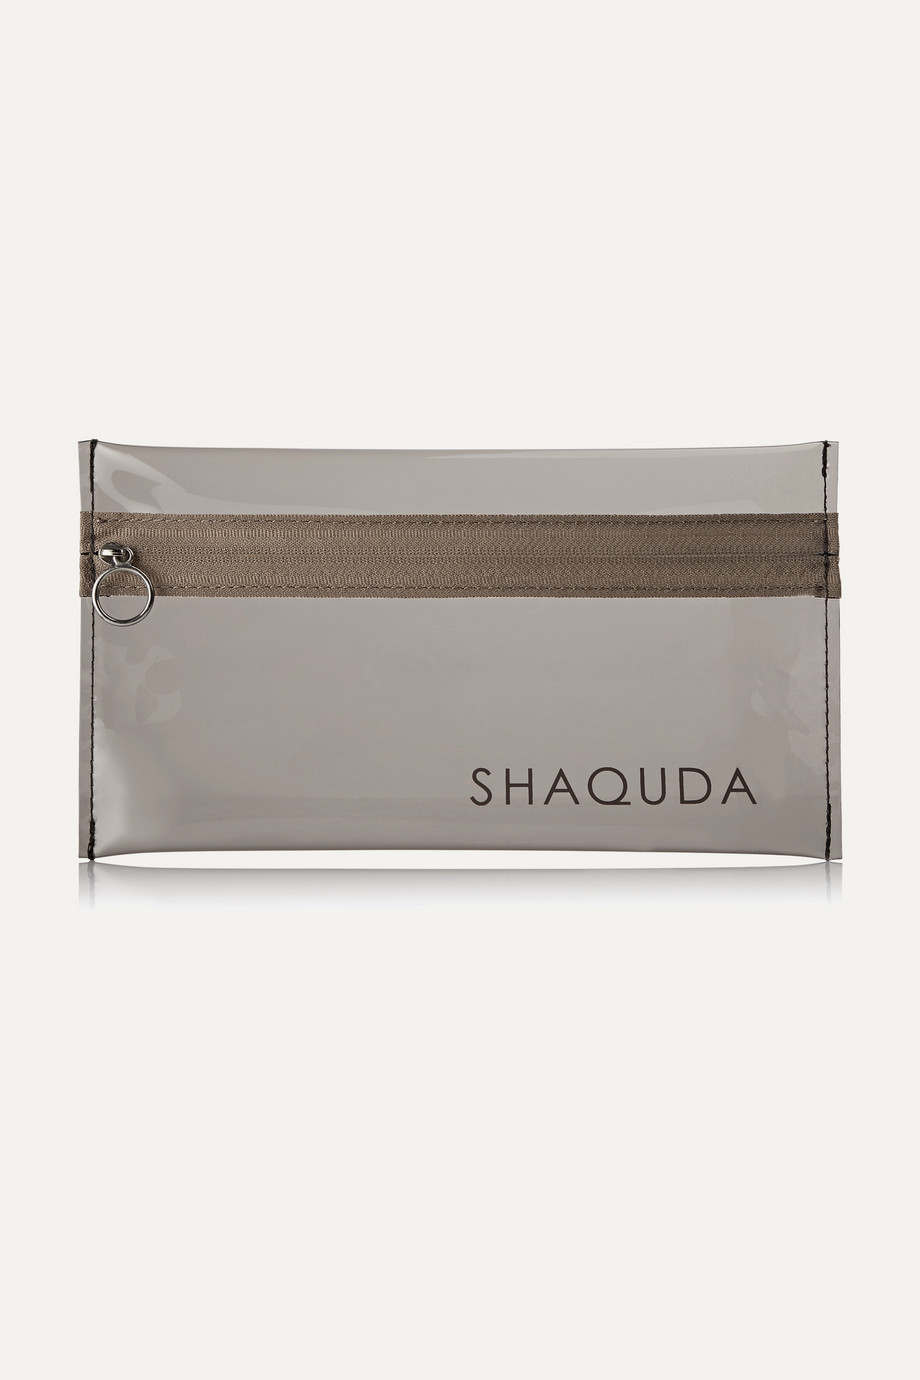 SHAQUDA Printed PVC brush case